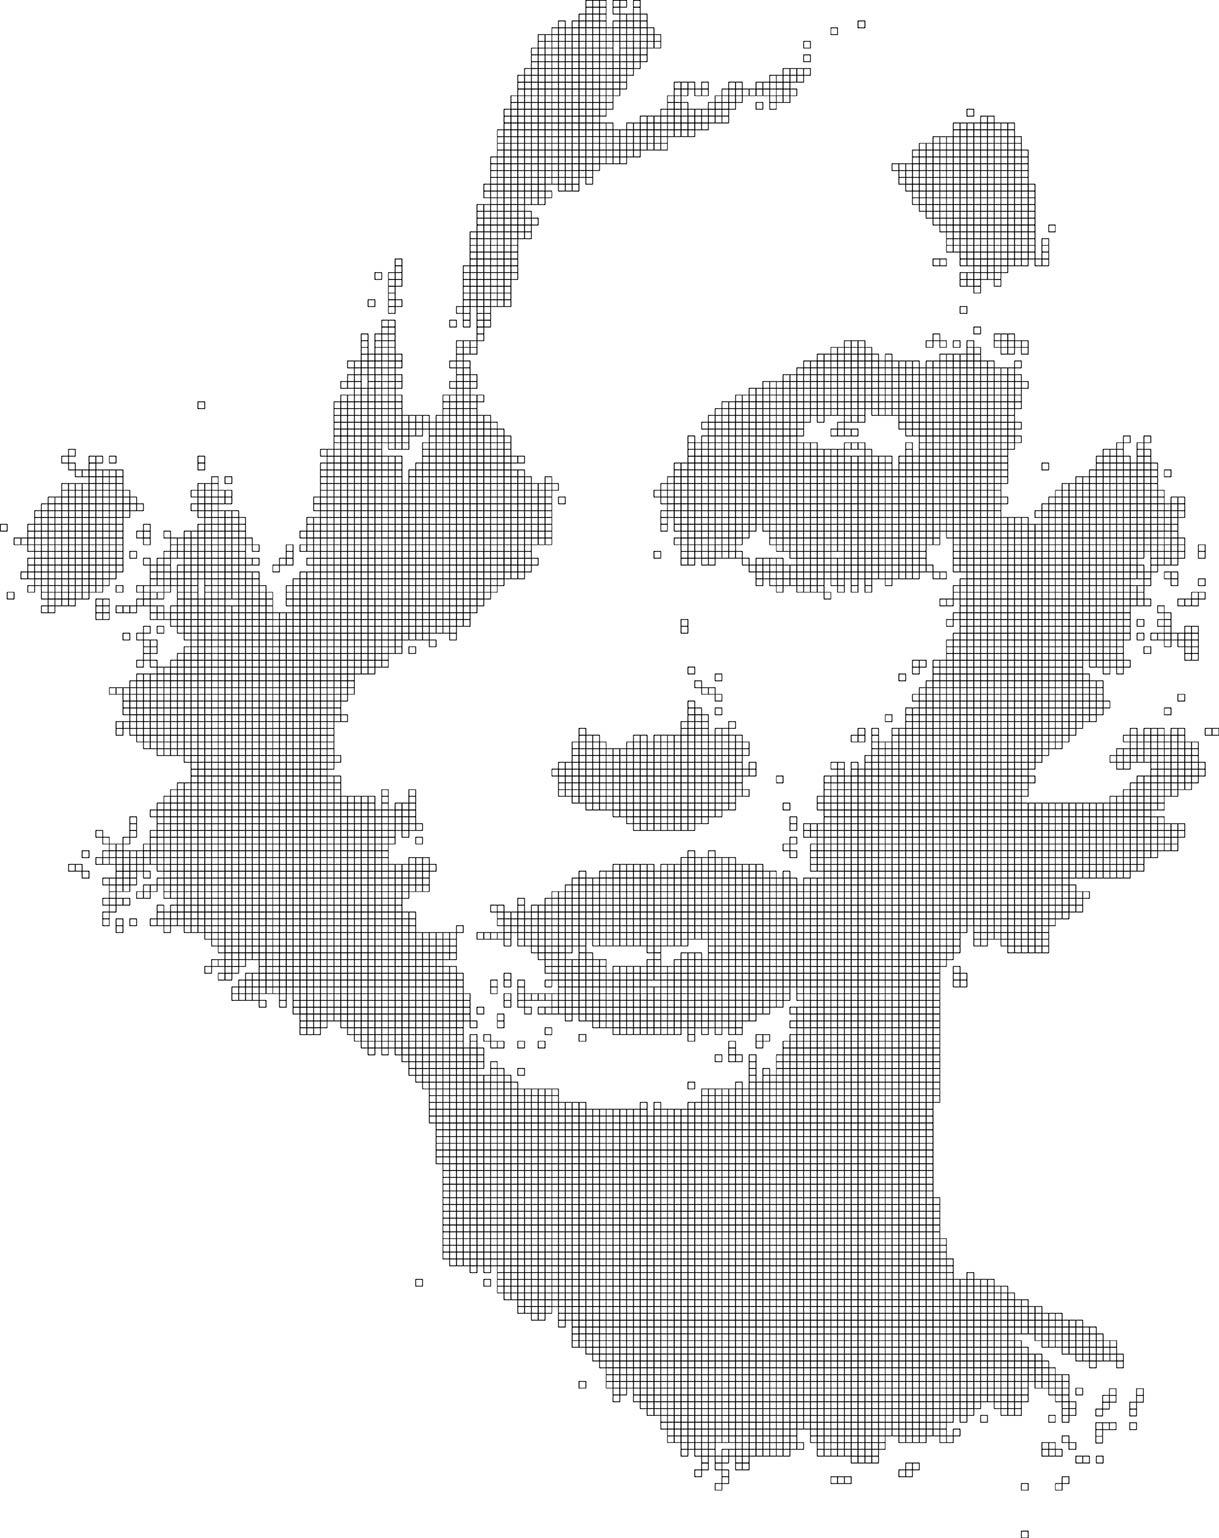 webkonturMM040414_farbe_100714-140714-5k+5y